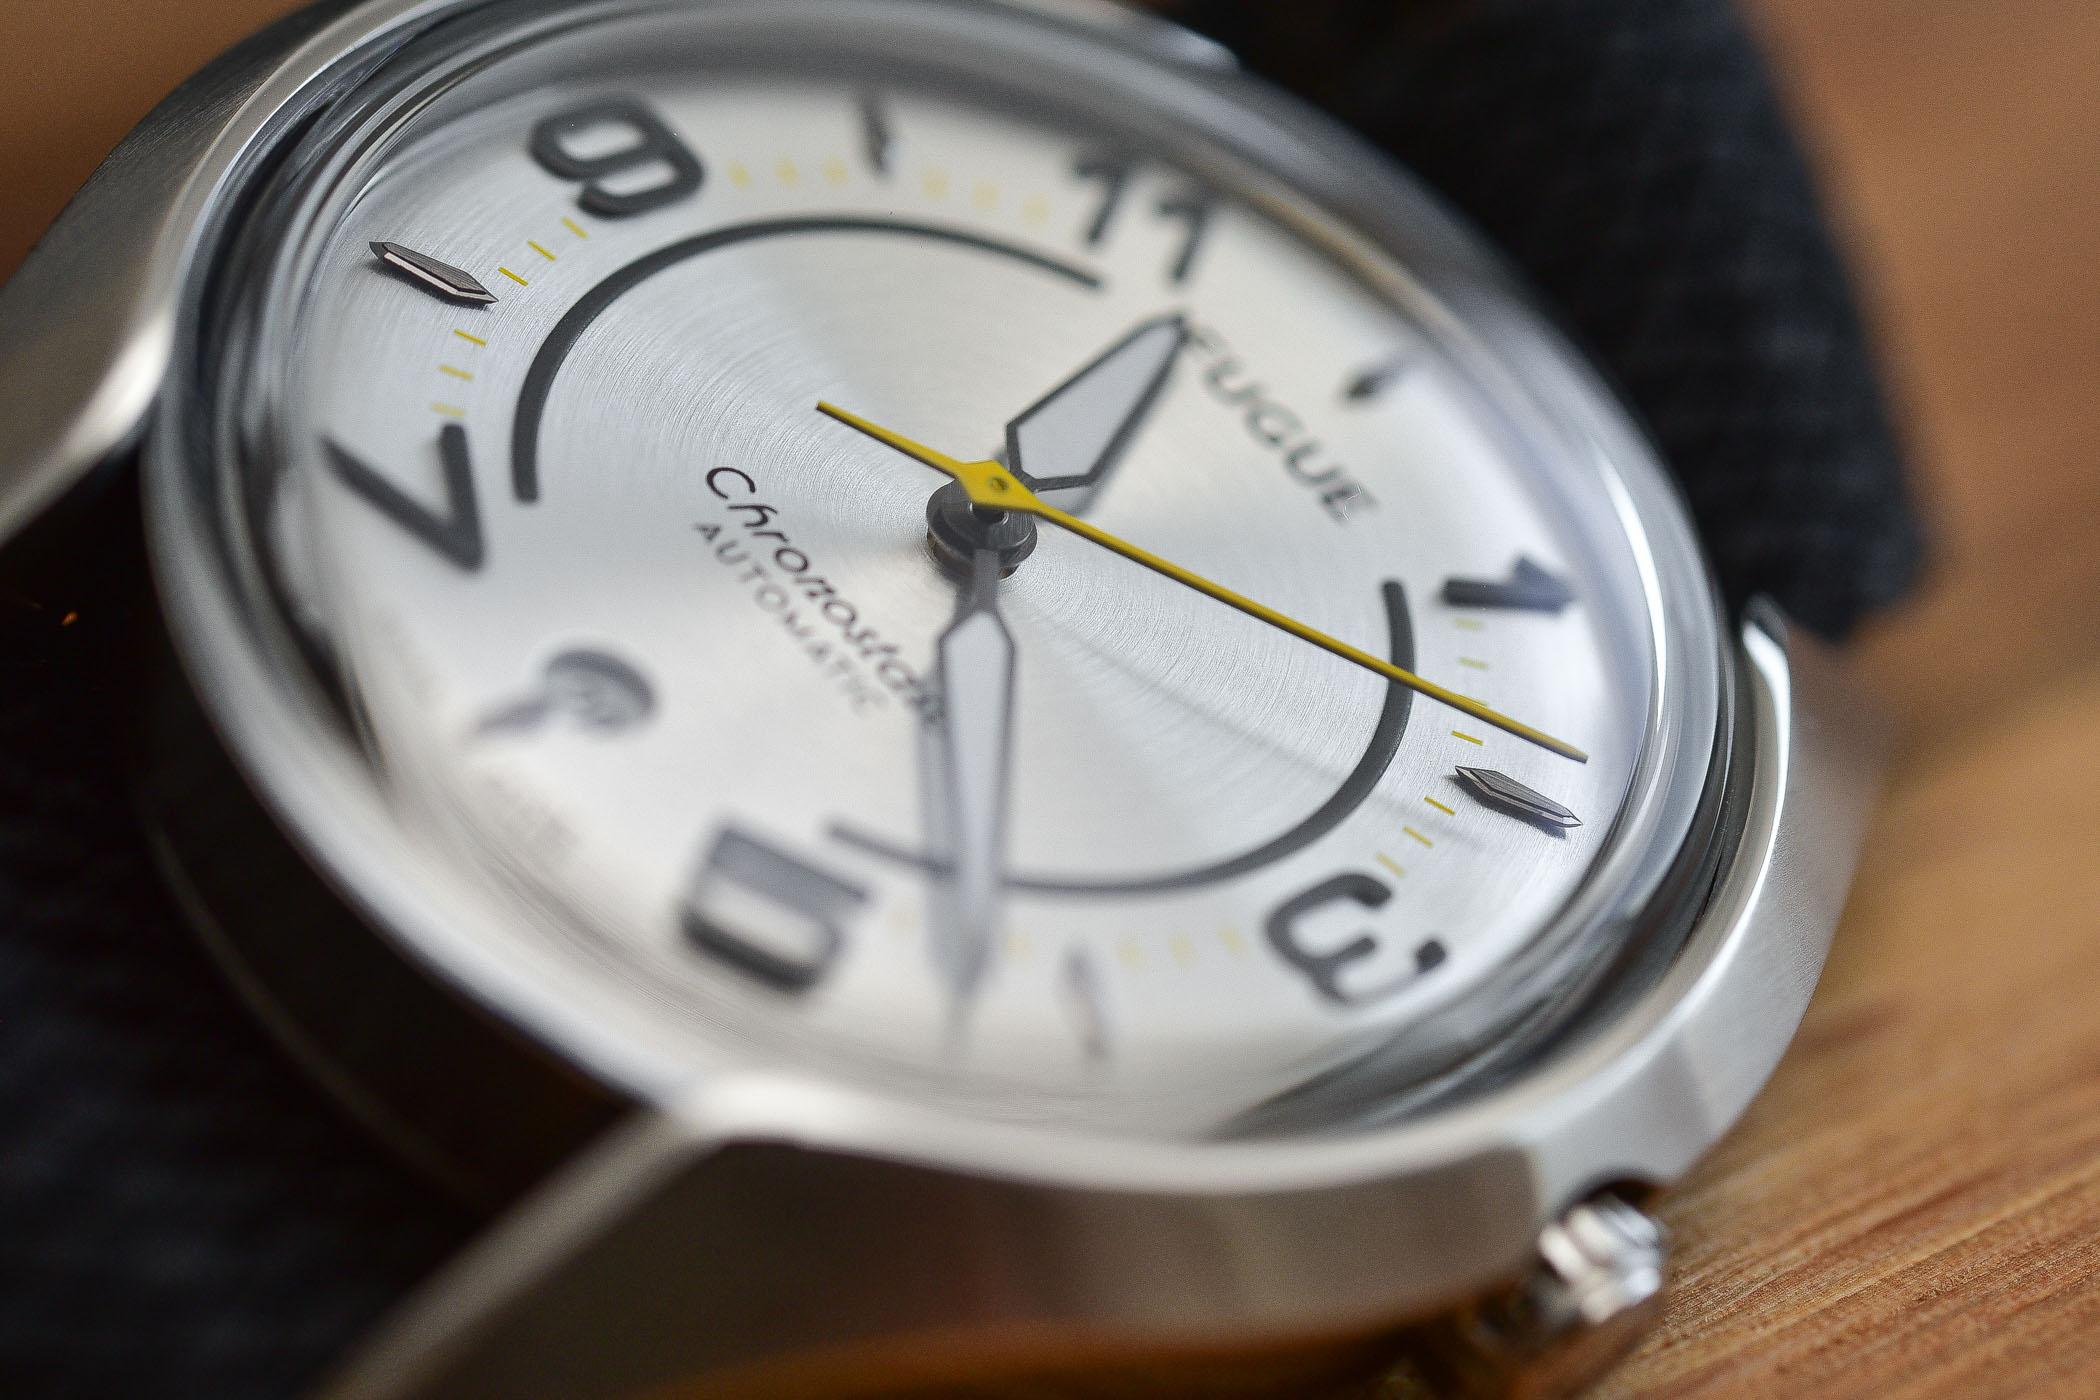 Fugue Watch Chronostase modular watch interchangeable case and strap - 2